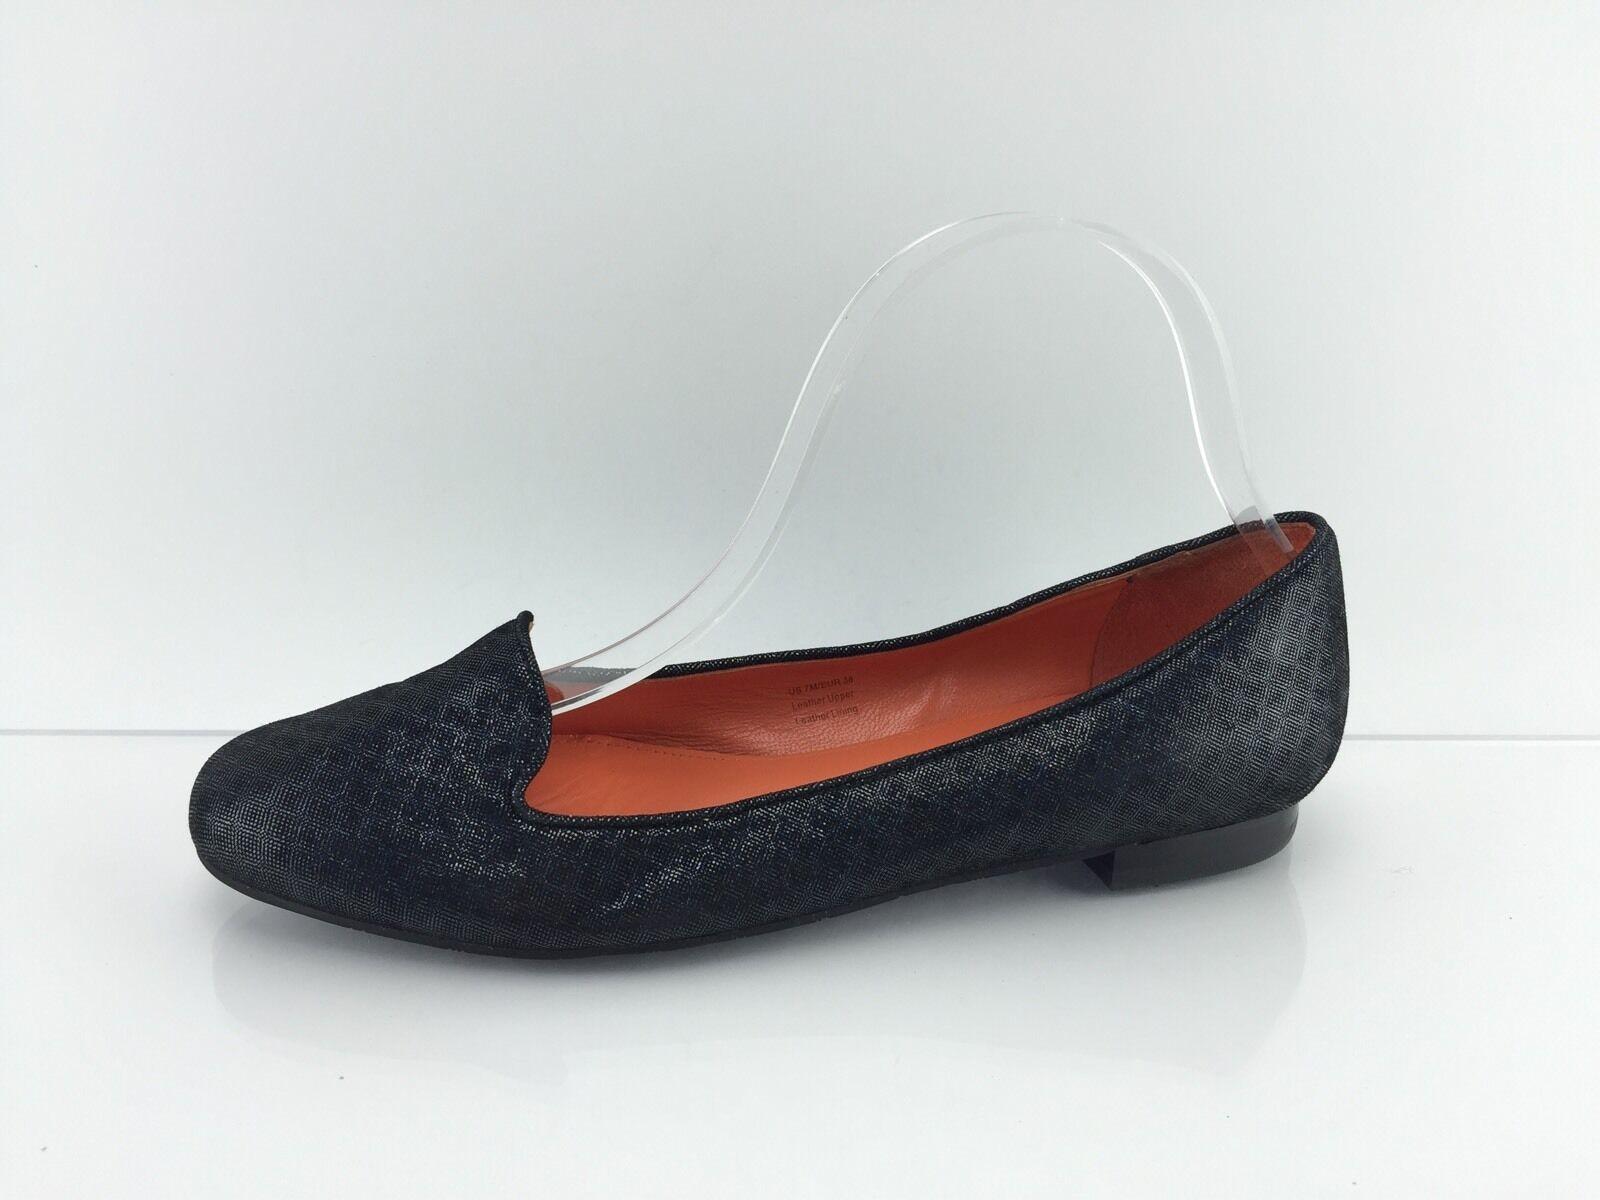 Via Spiga Women's Black/Multi Color Sparkled Flats 7 M